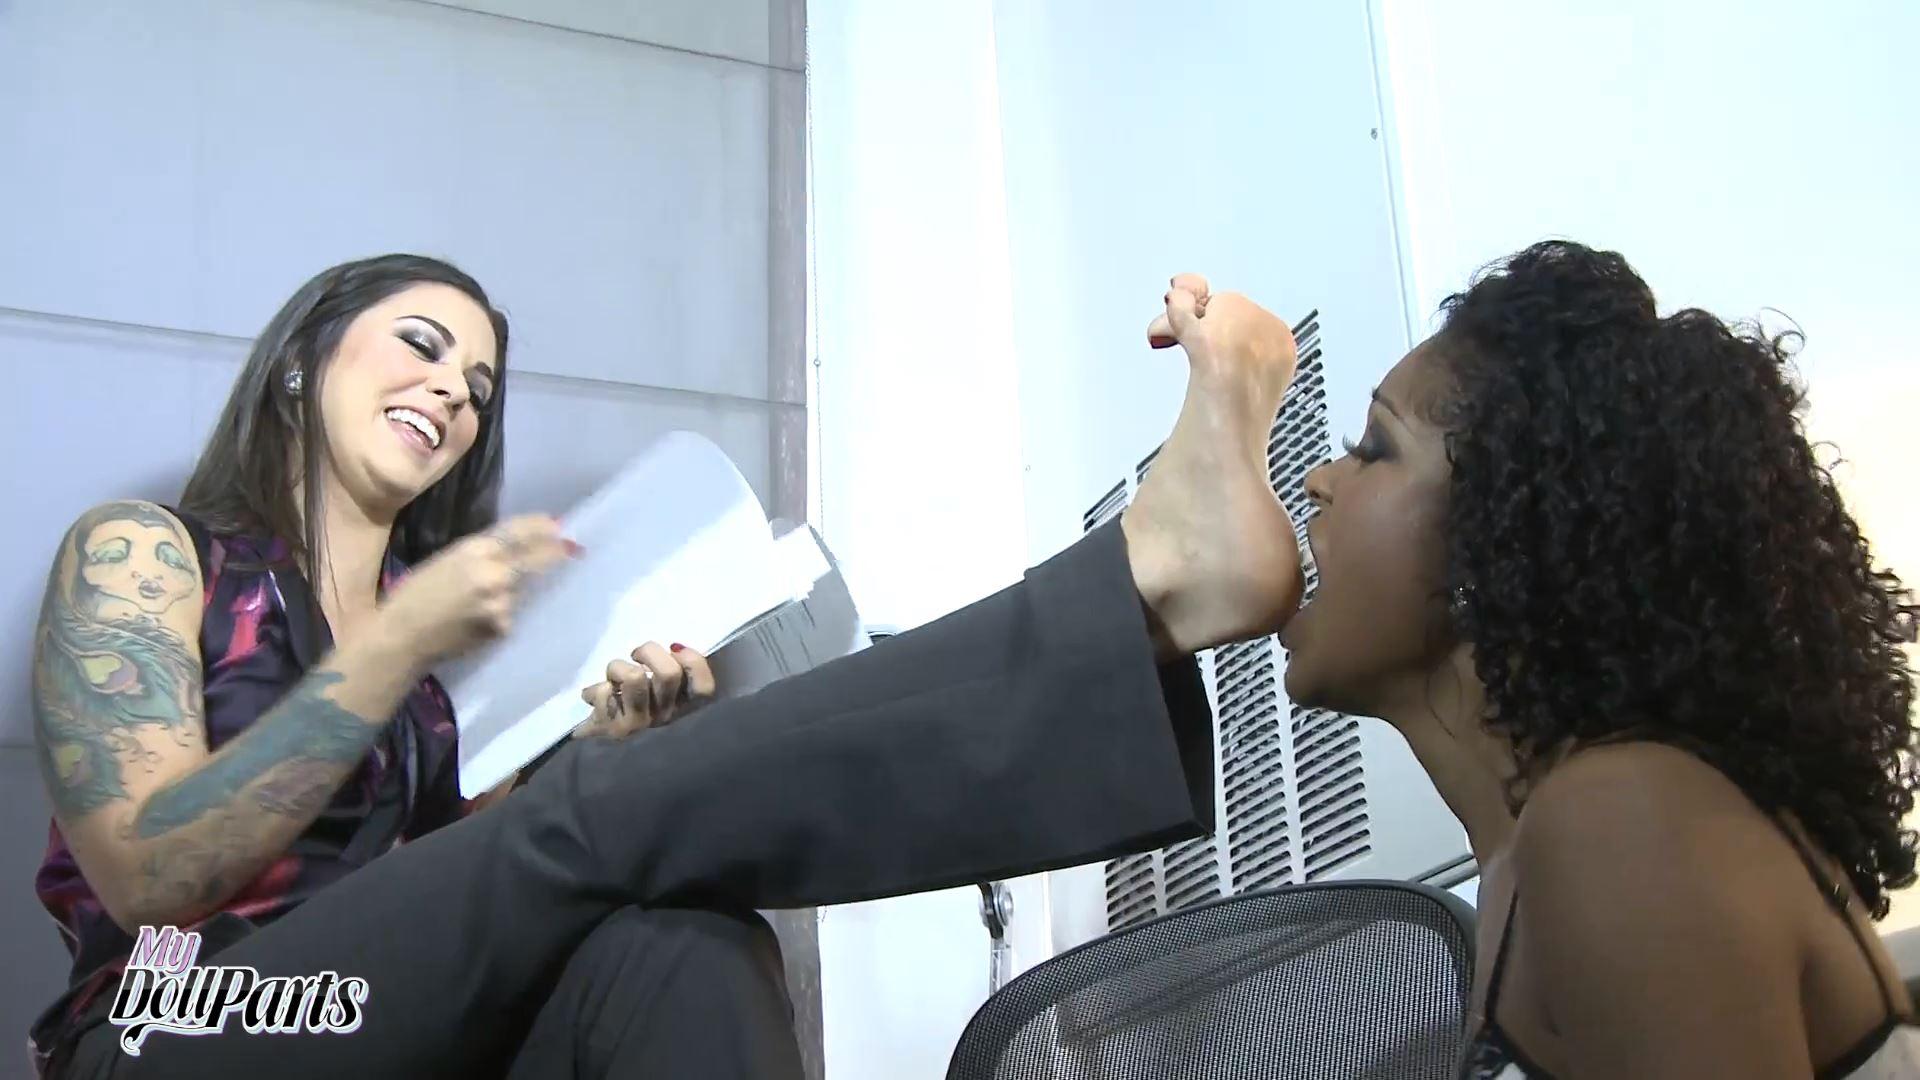 Kayla Jane, Lotus Lain In Scene: Office Exchange - MYDOLLPARTS - FULL HD/1080p/MP4